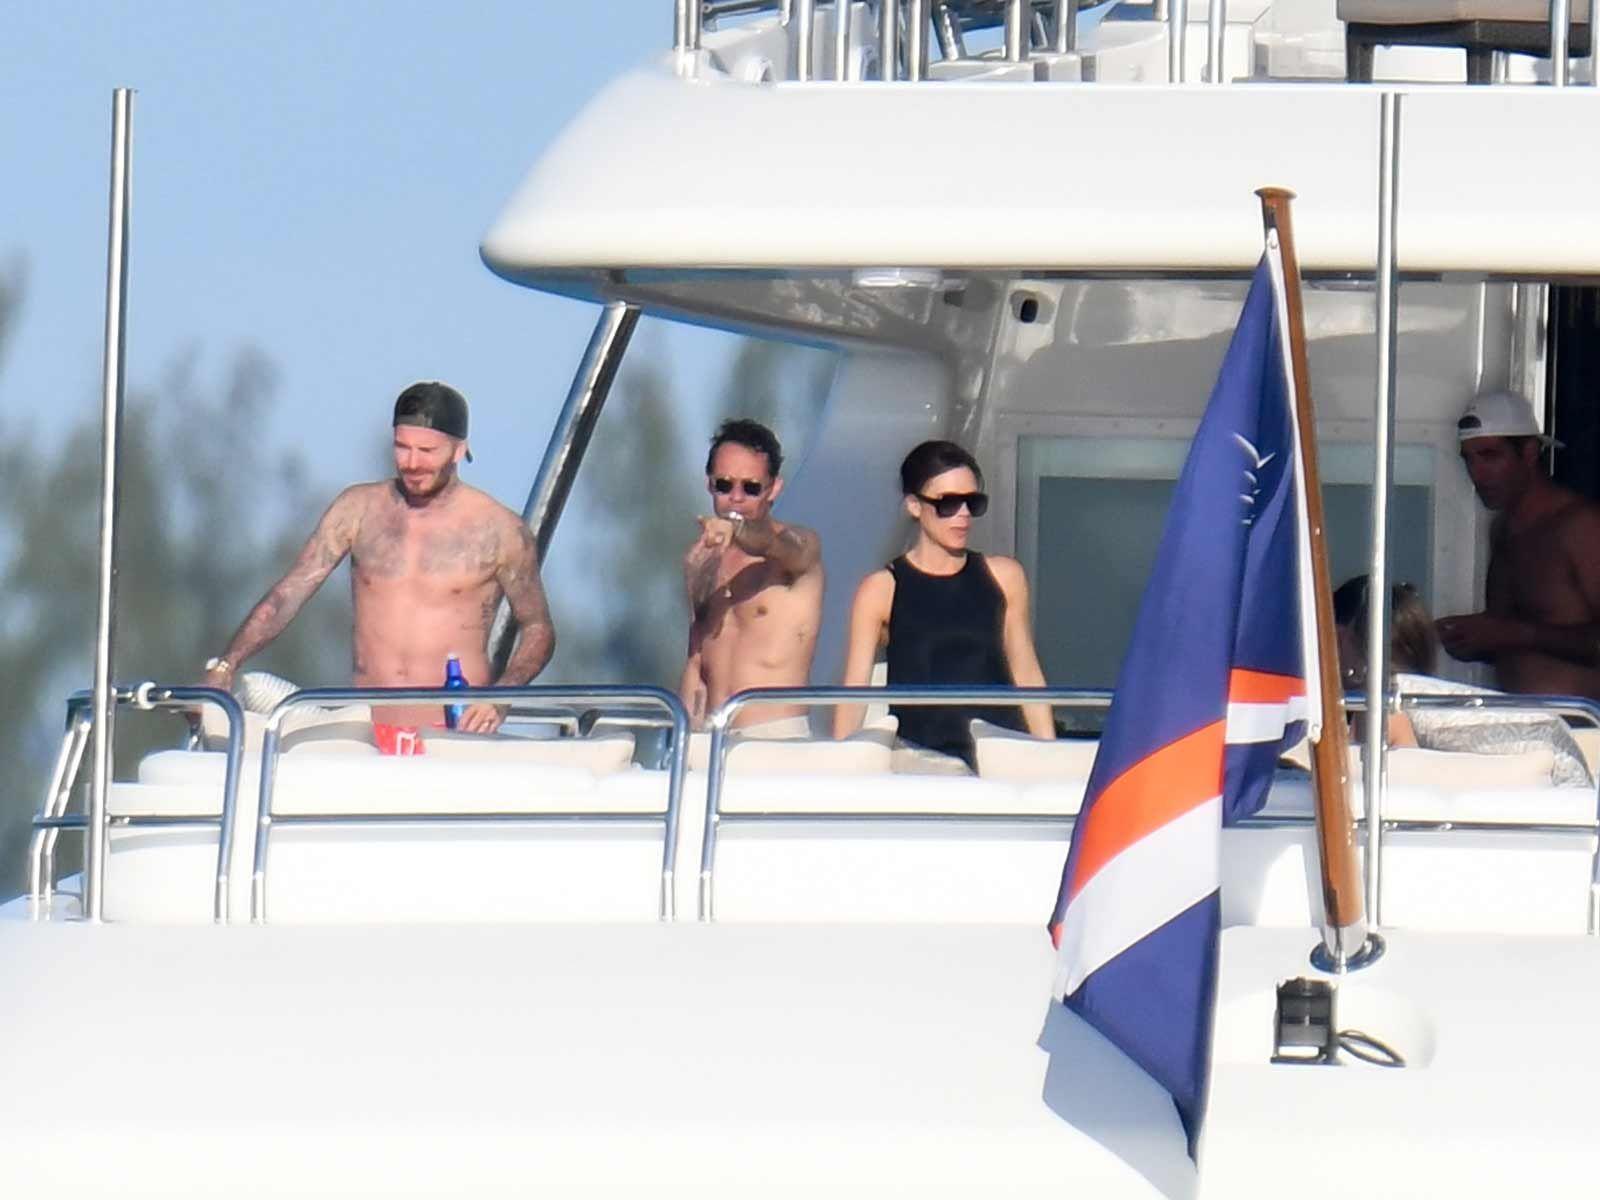 Inside Marc Anthony and David Beckham's Insane $7 Million